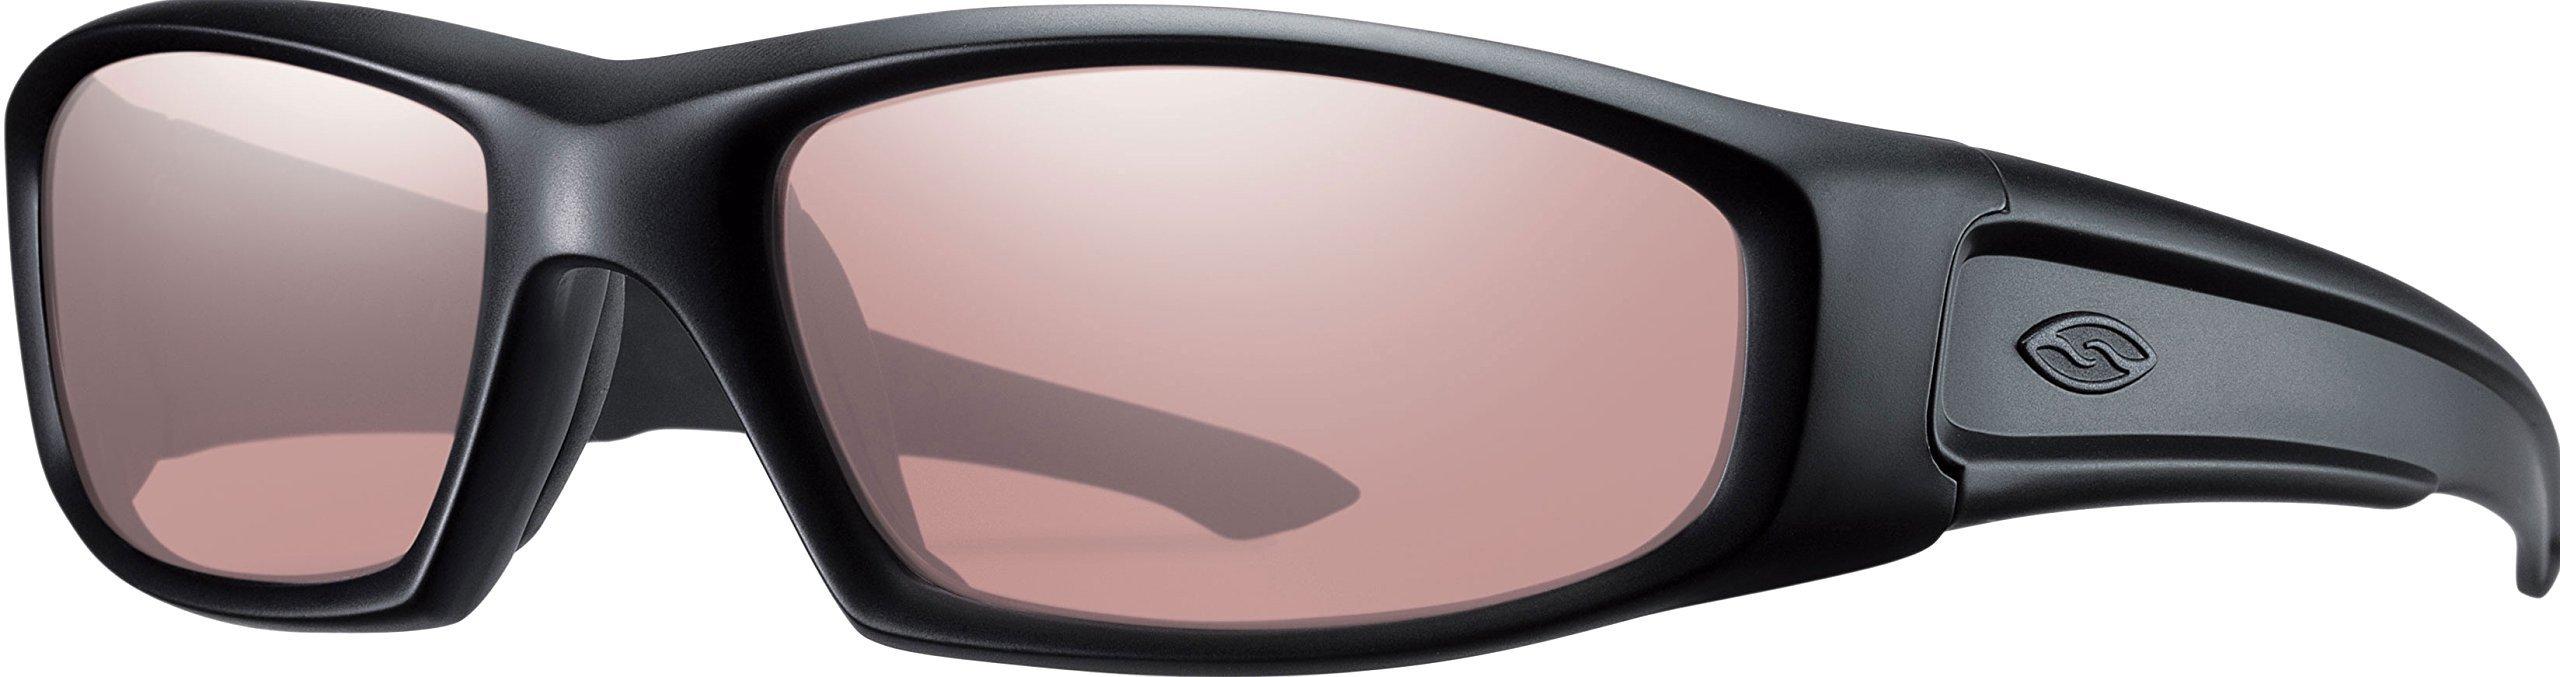 Smith Optics Hudson Tactical Sunglass with Black Frame (Ignitor Lens) by Smith Optics Elite